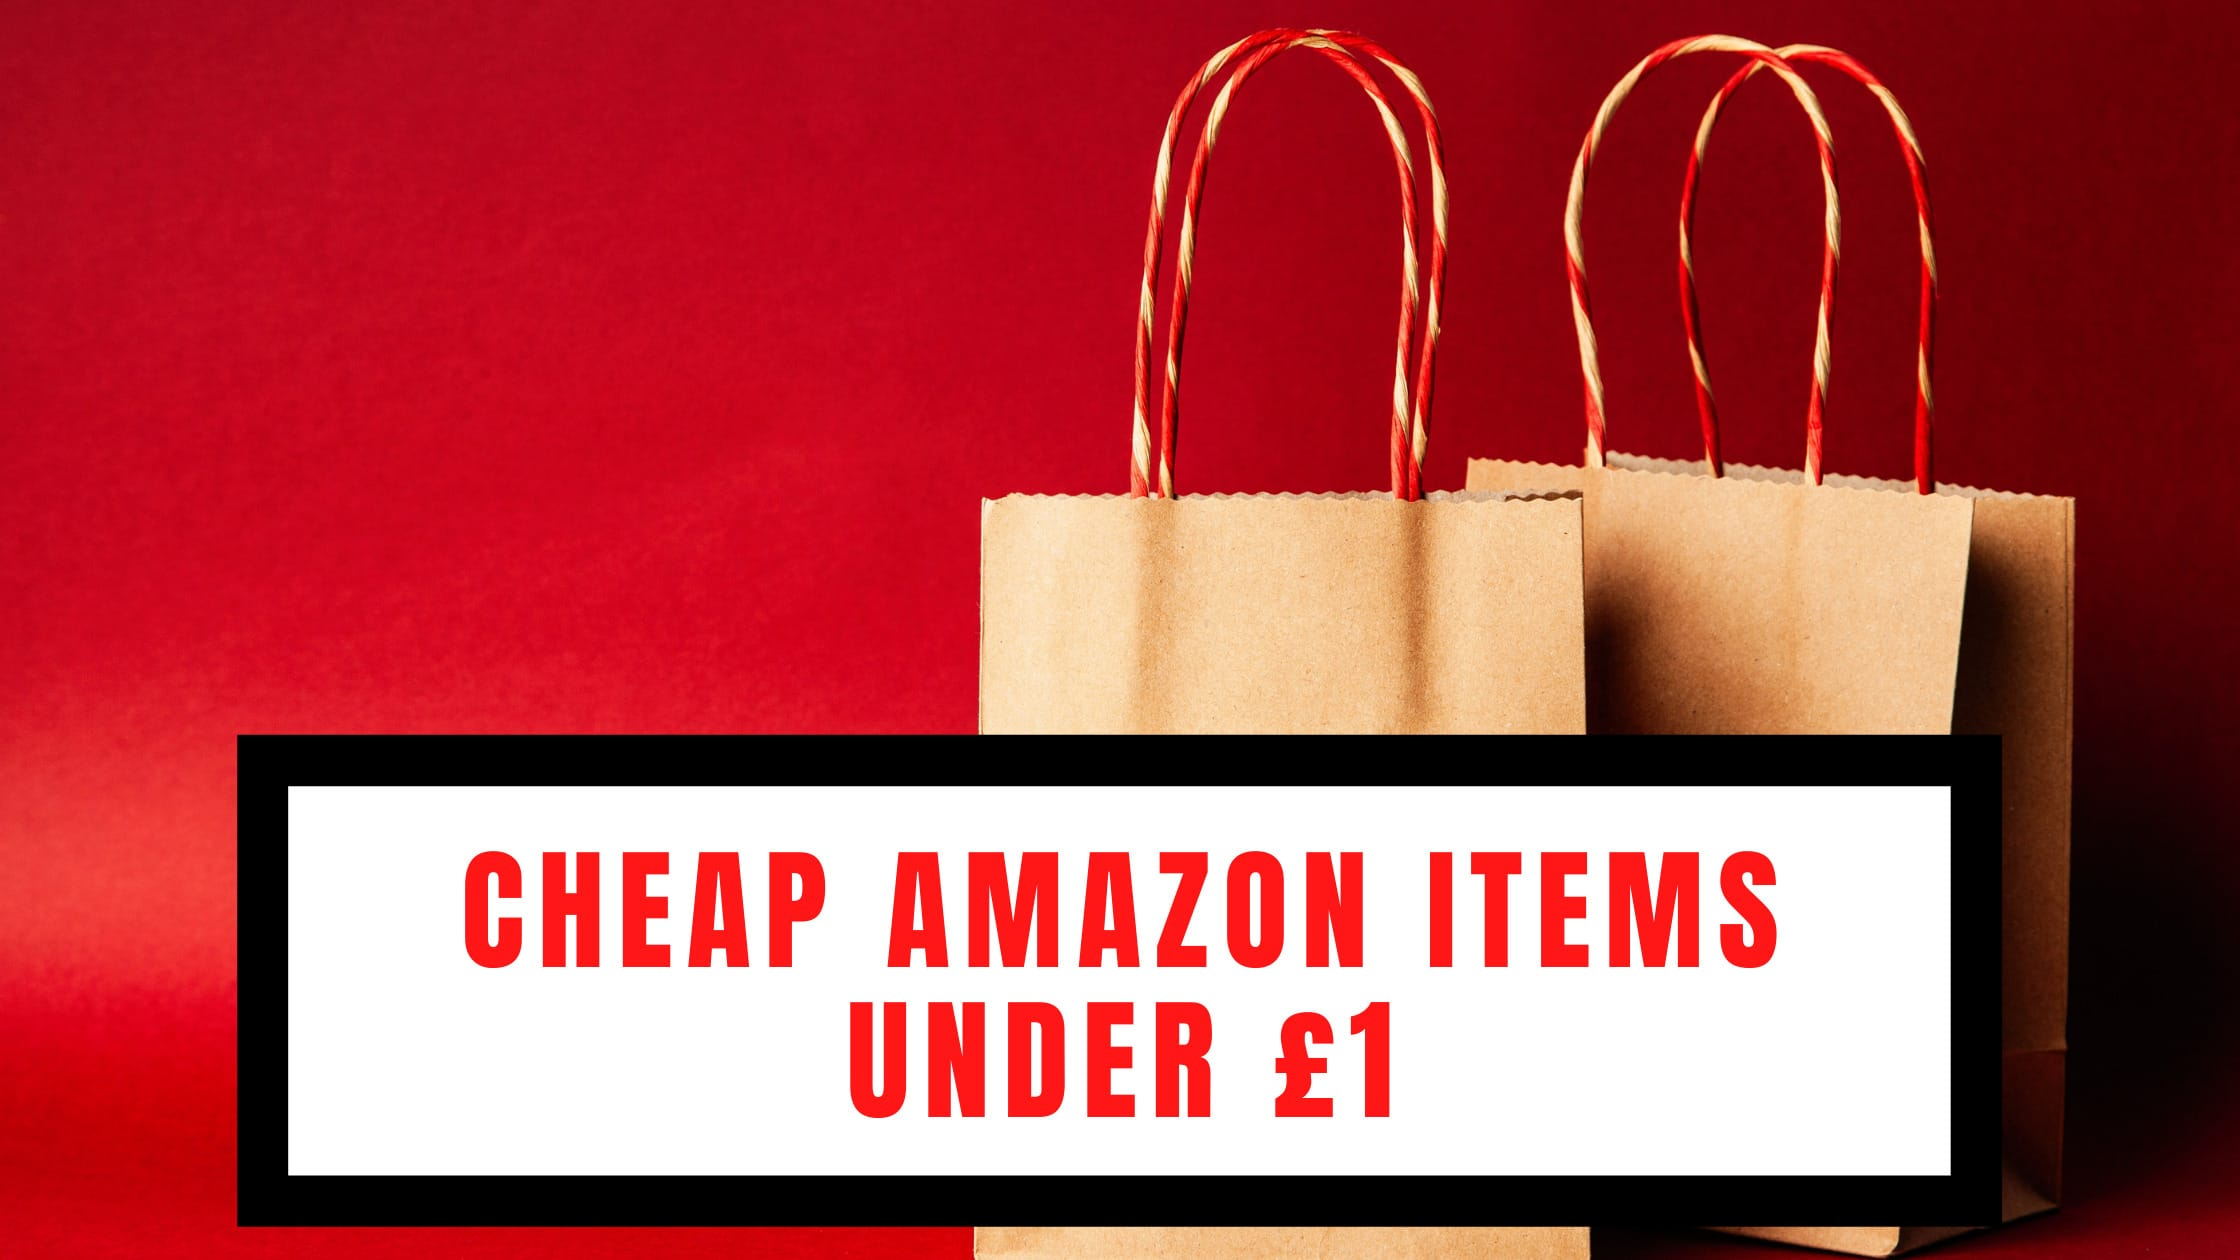 Cheap Amazon Items Under £1